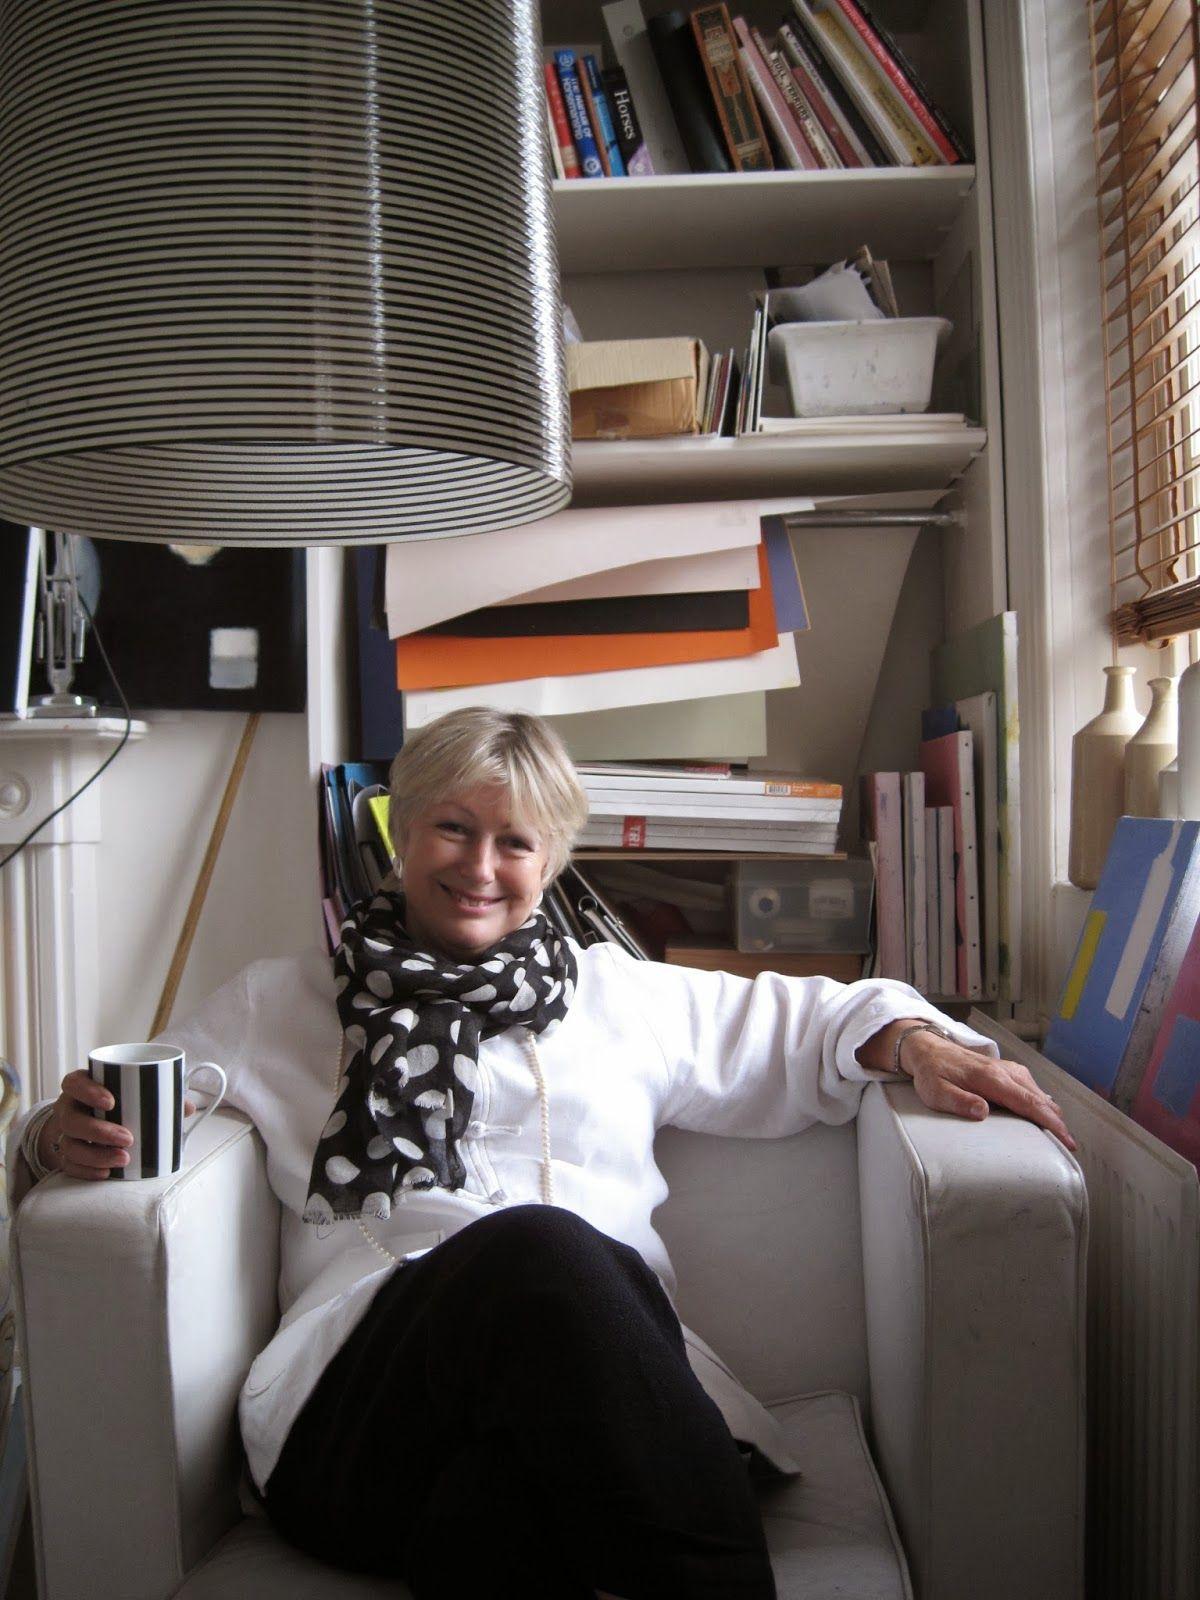 Janey Sharratt - That's Not My Age blog